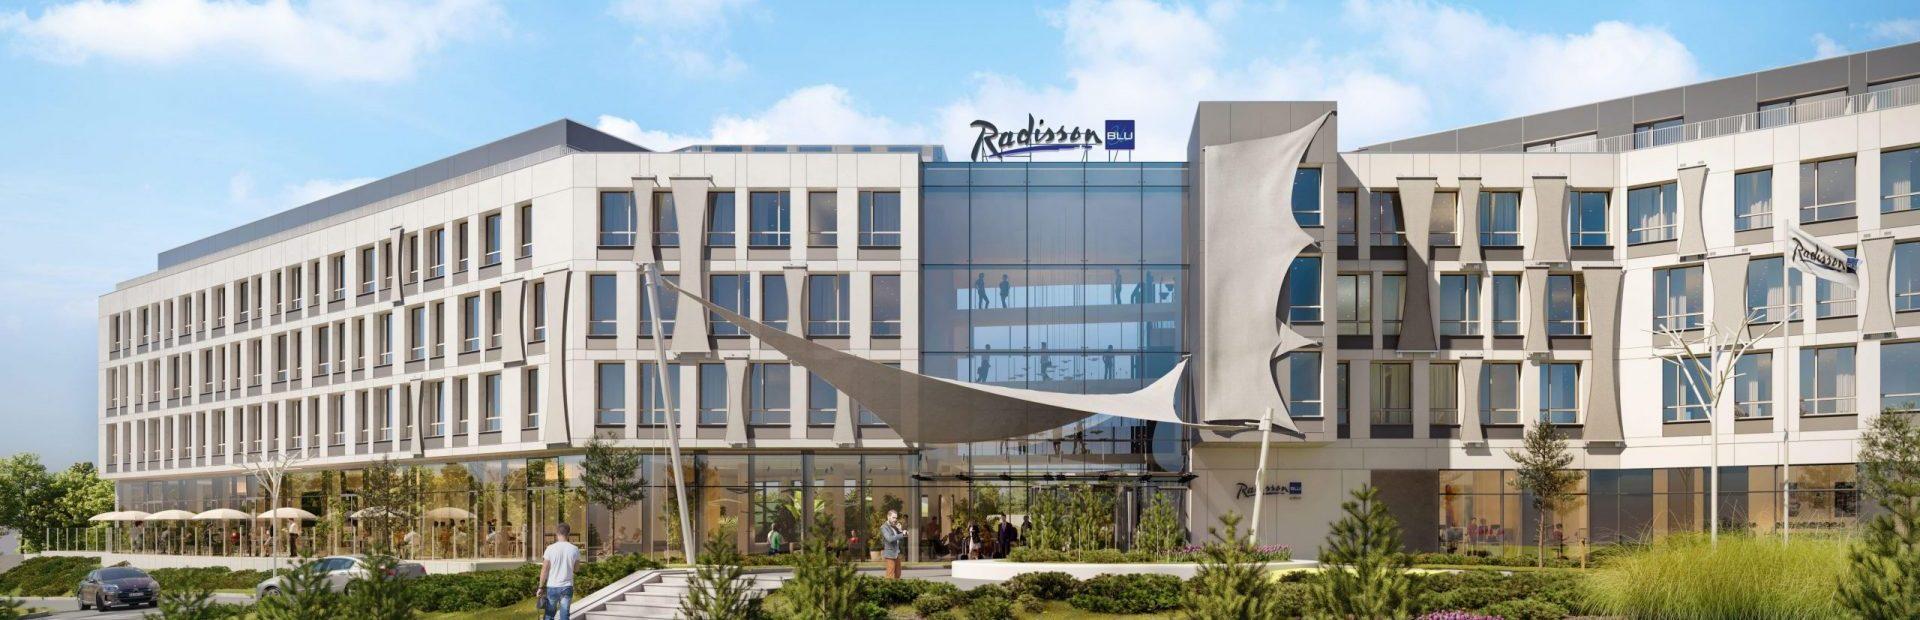 Radisson Blu Sopot